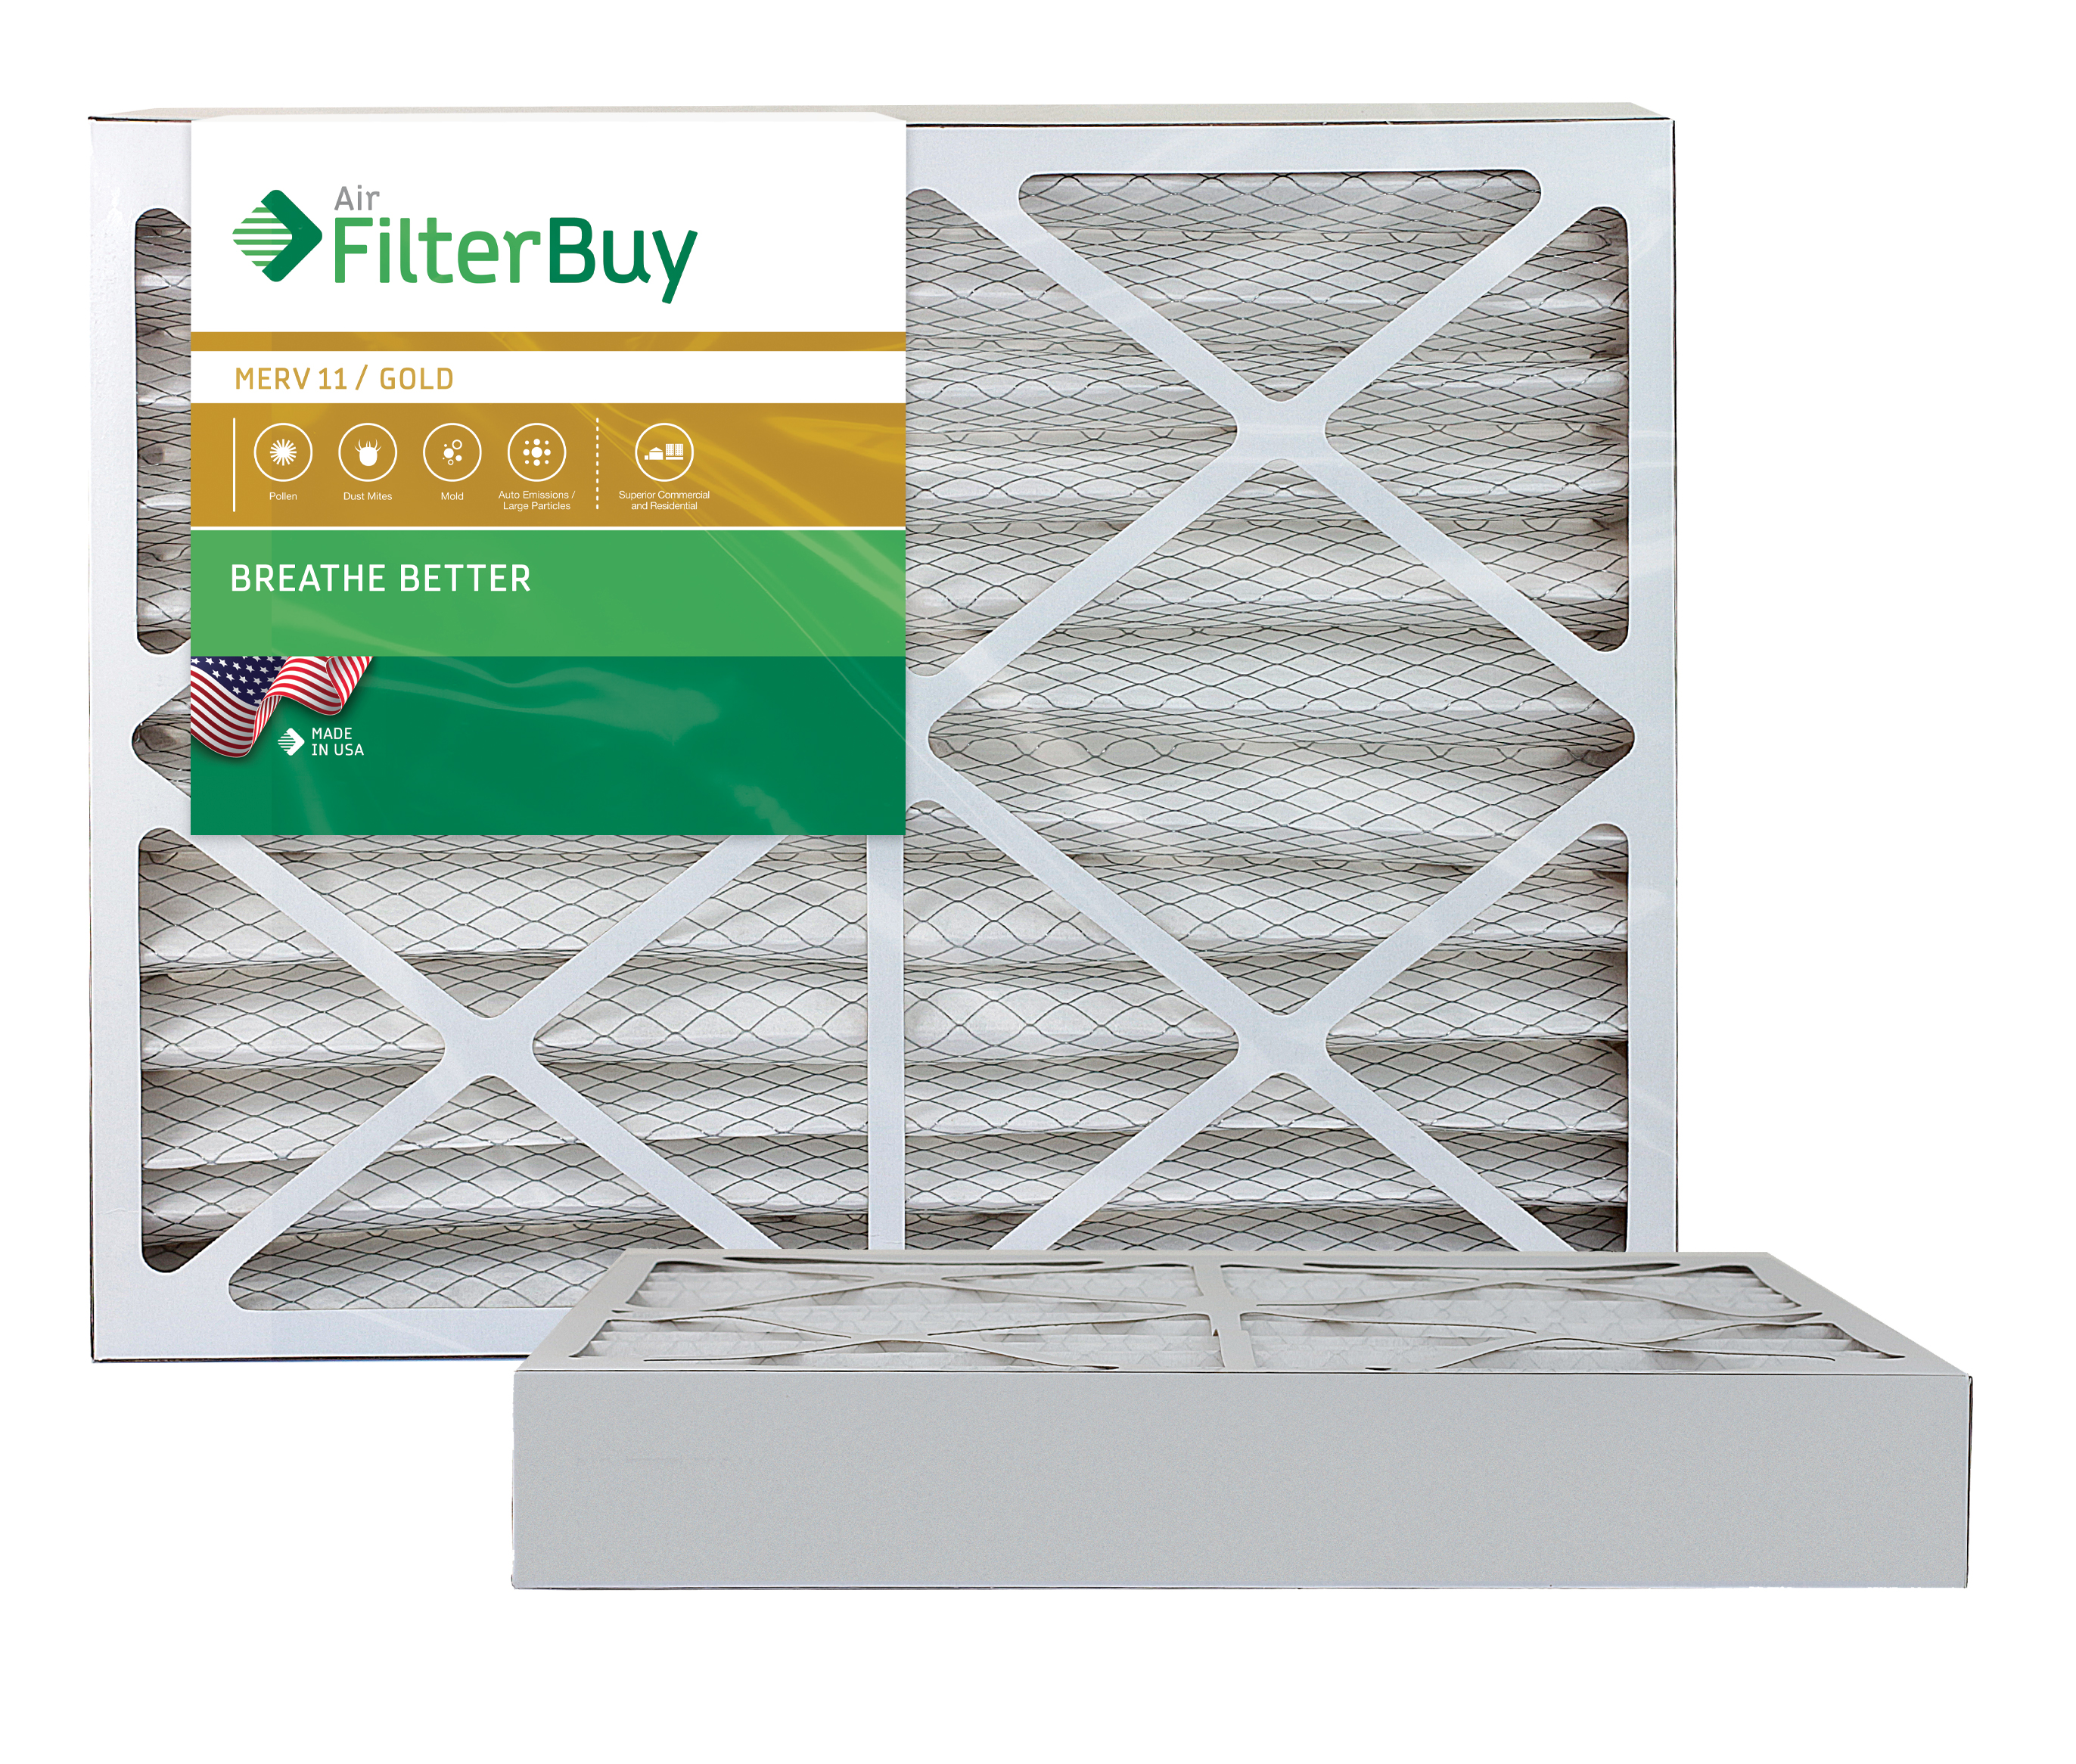 MERV 11 FilterBuy 18x20x1 Pleated HVAC AC Furnace Air Filter AFB Gold